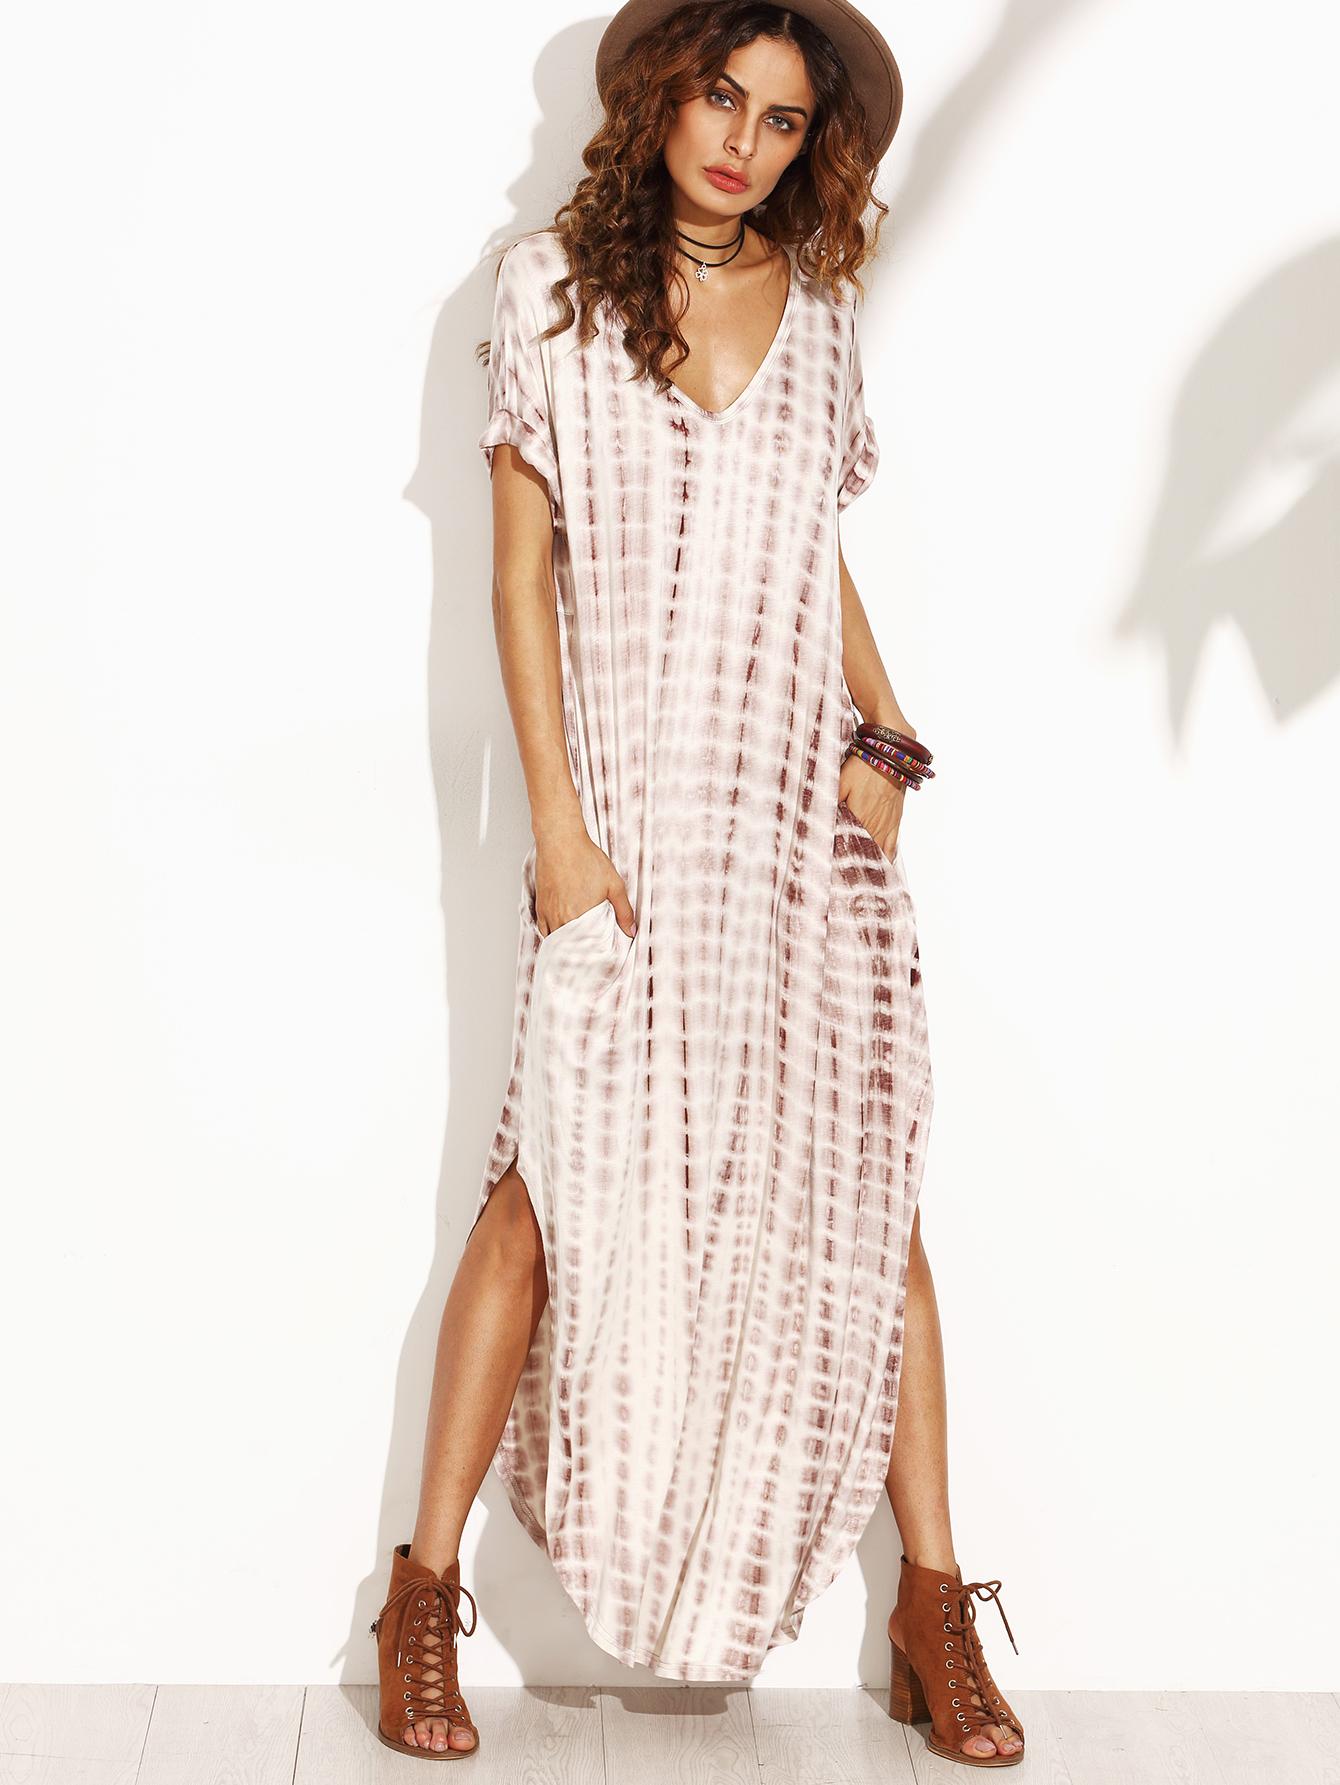 c0bedf7a74da1 Women's Tie Dye Print Maxi Dress w/ Split Curved Hem V-Neck Outfit ...